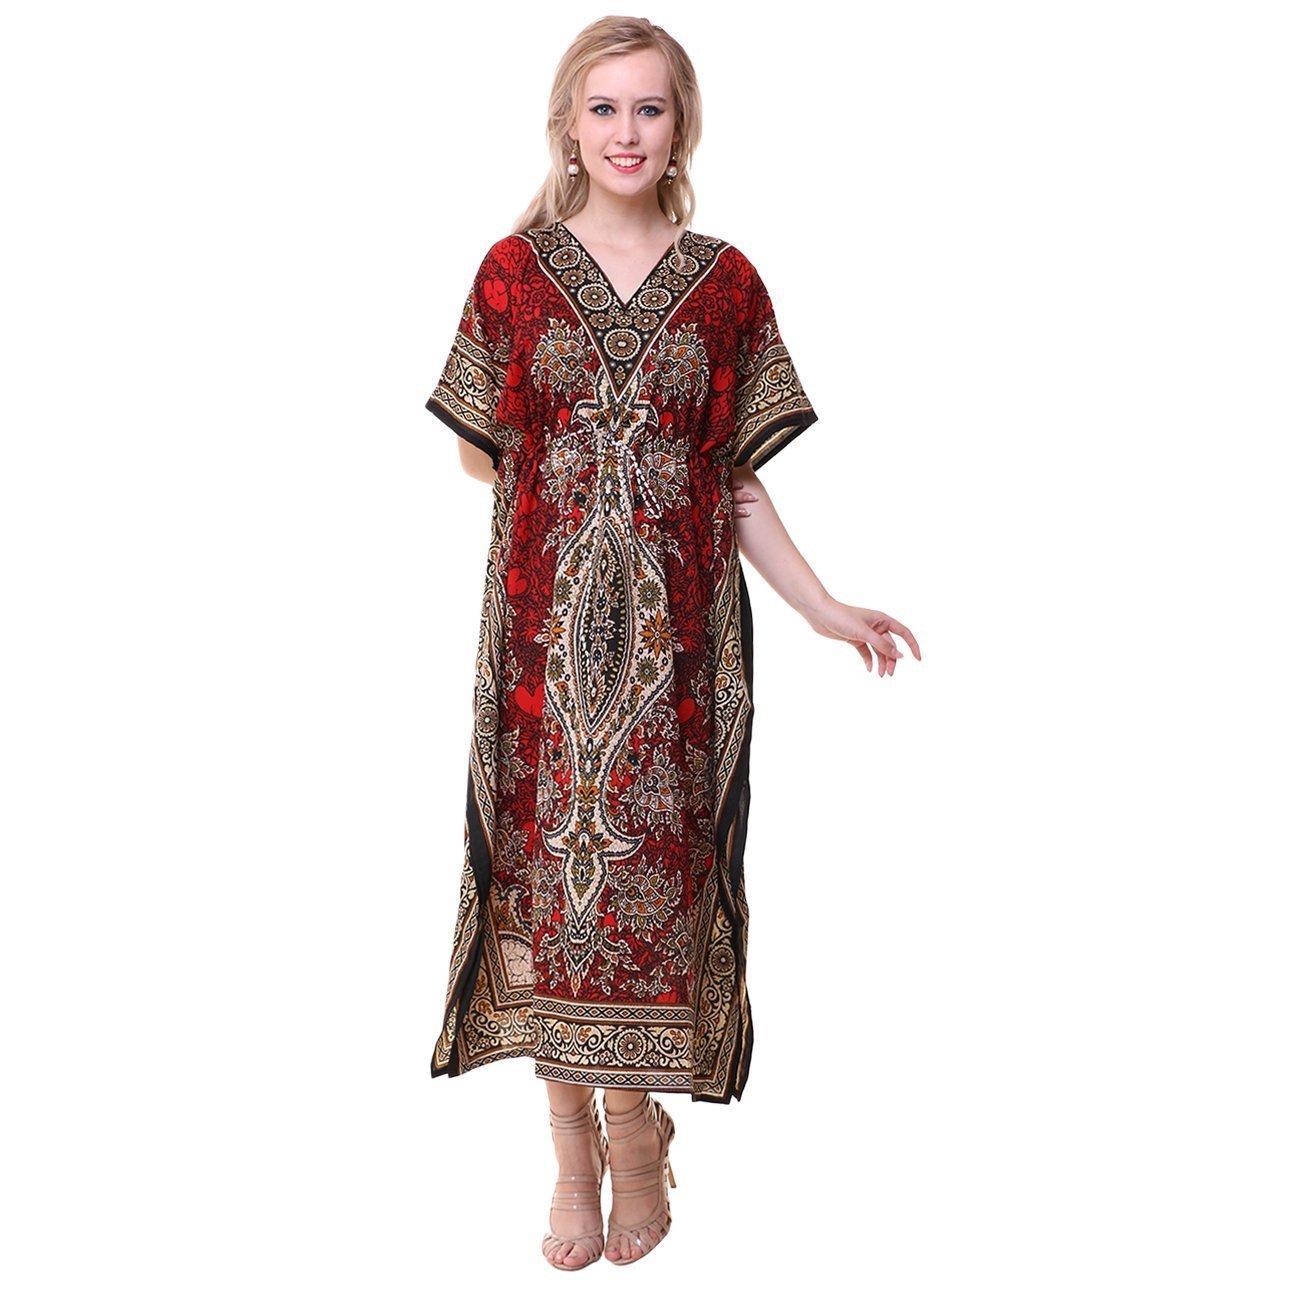 Royal Kurta Women's Dashiki Kaftans Viscose Kimono Lounger Dress